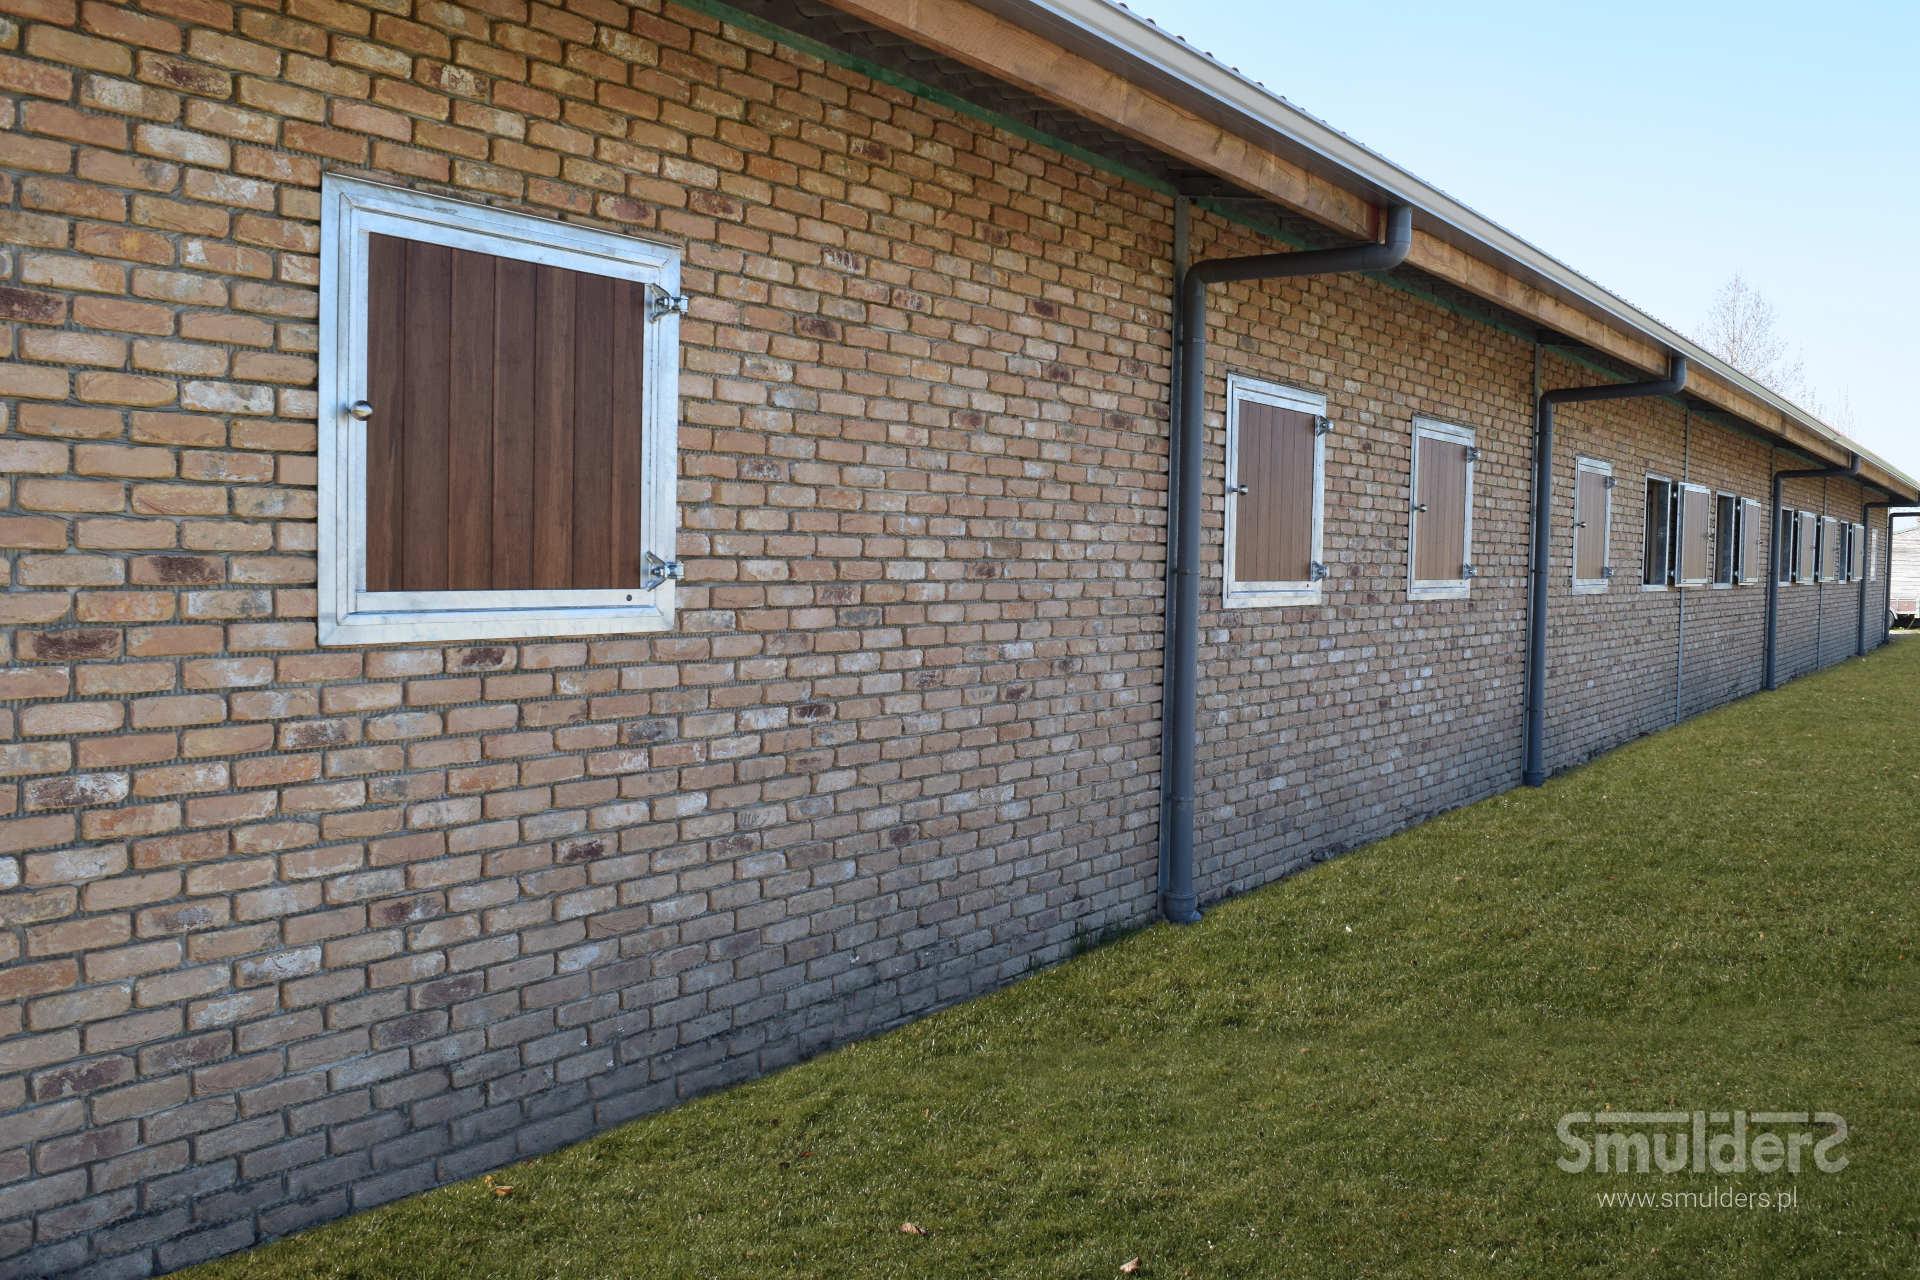 https://www.smulders.pl/wp-content/uploads/2019/03/f009_internal-stables_windsor_doors_windows_barn-doors_PRSH_SMULDERS_PL.jpg